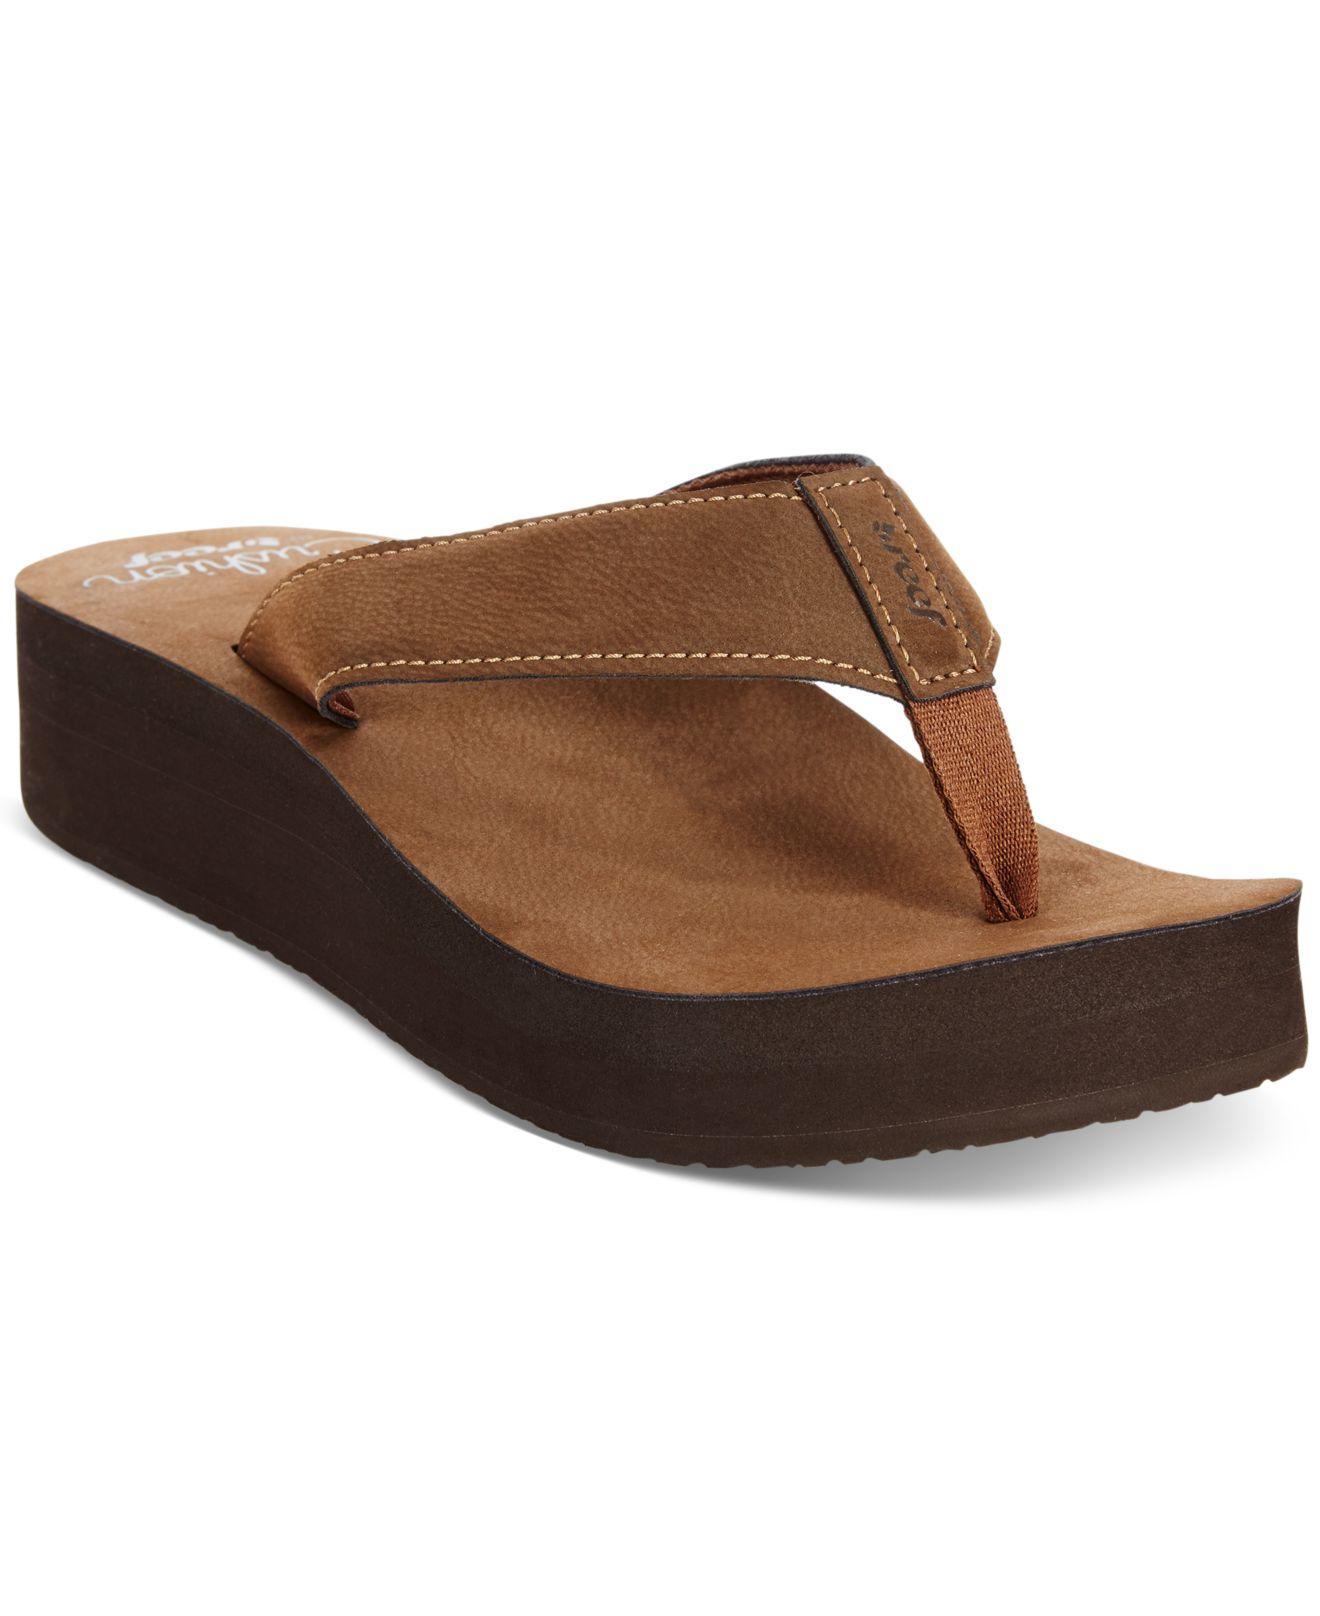 Cool Reef Reef Sandy Women Open Toe Textile Brown Thong Sandal Sandals